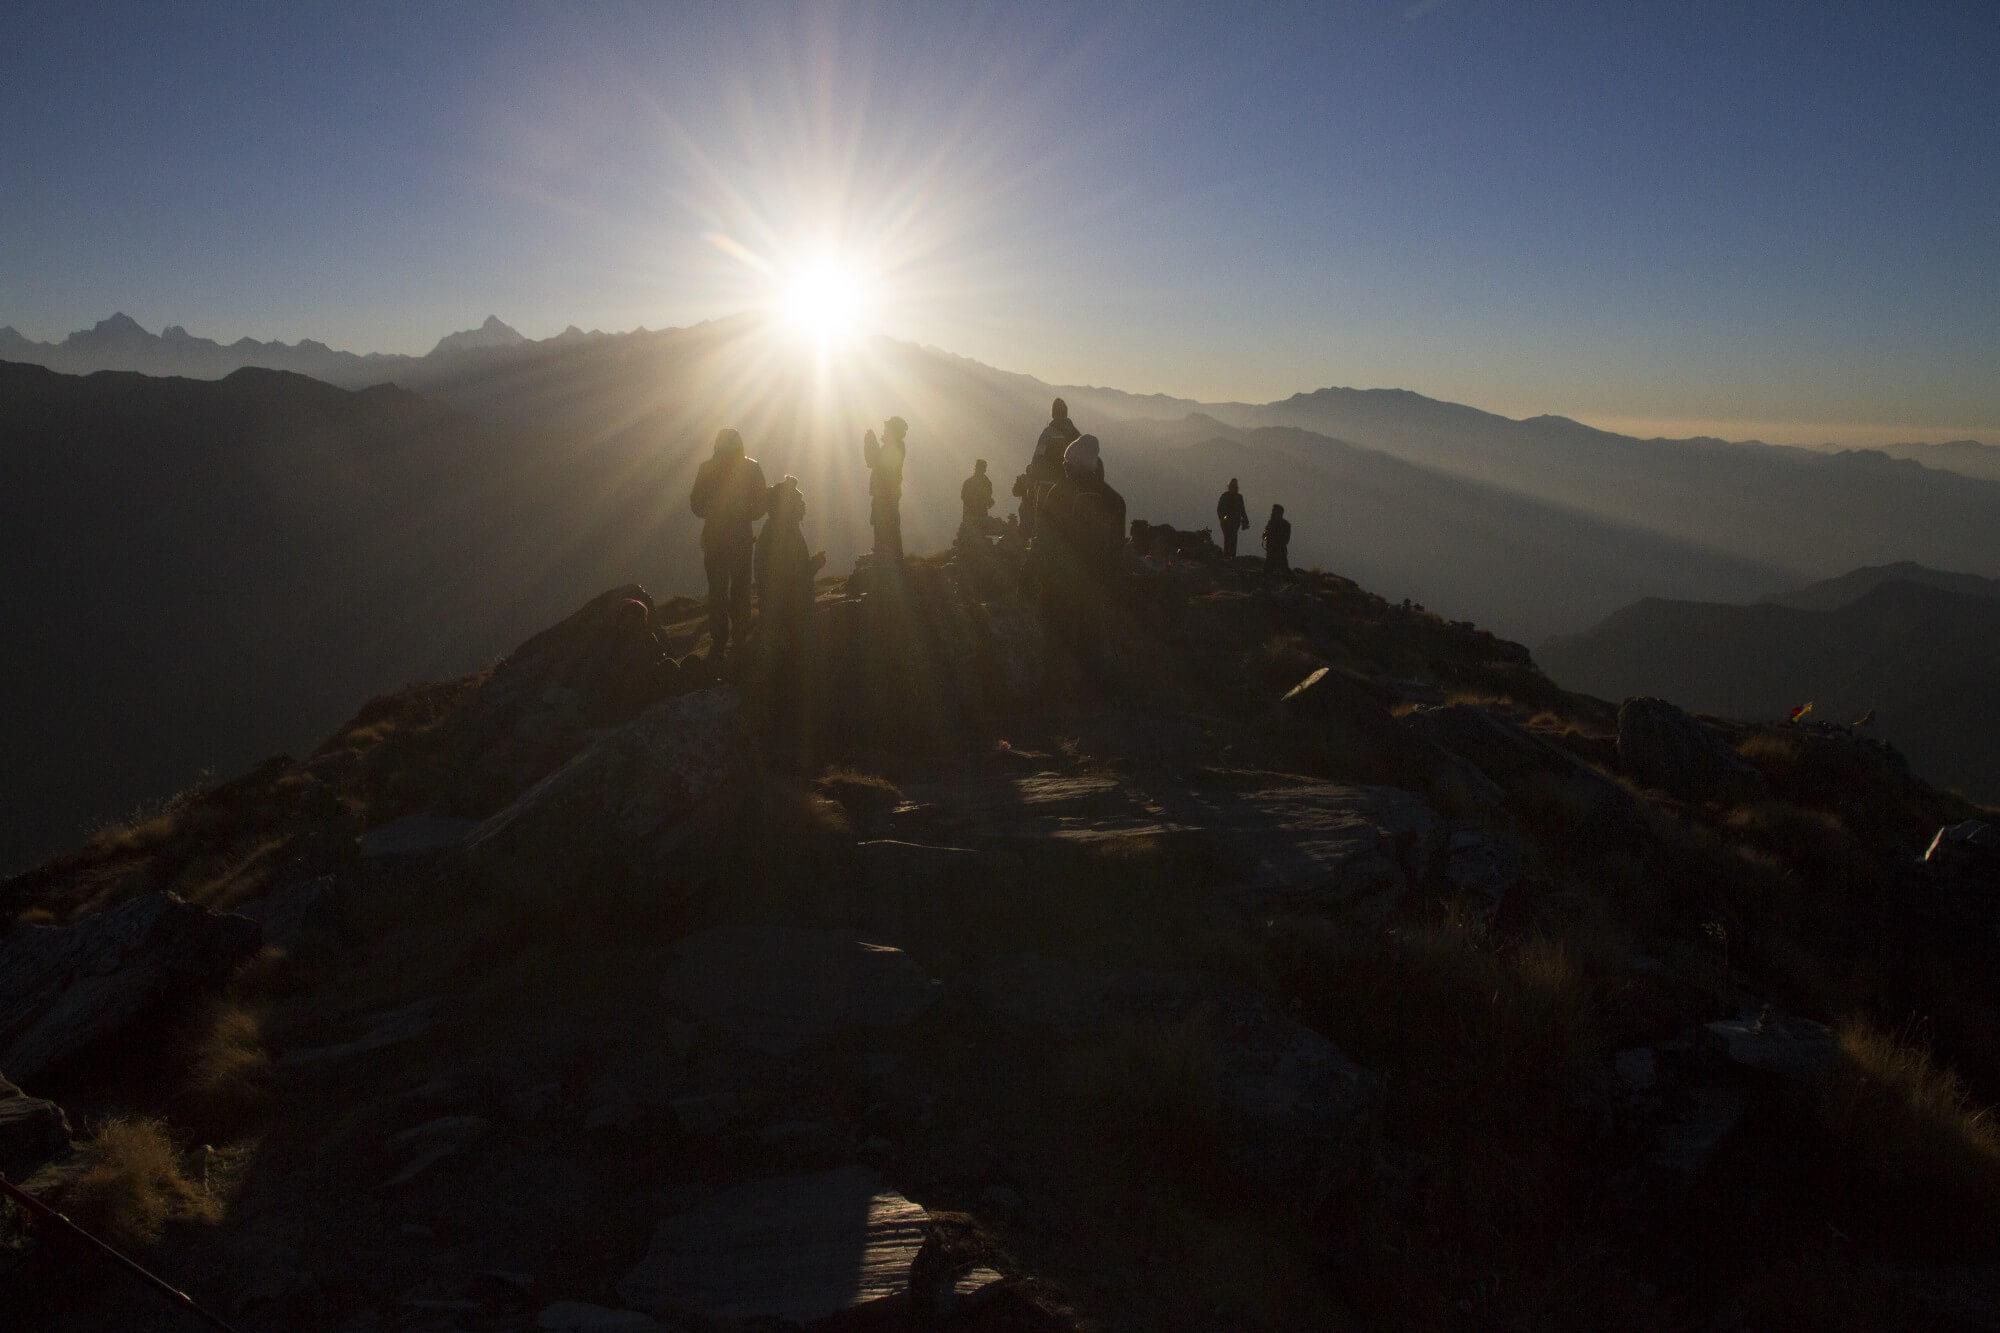 Deoriatal—Chandrashila Peak Trek